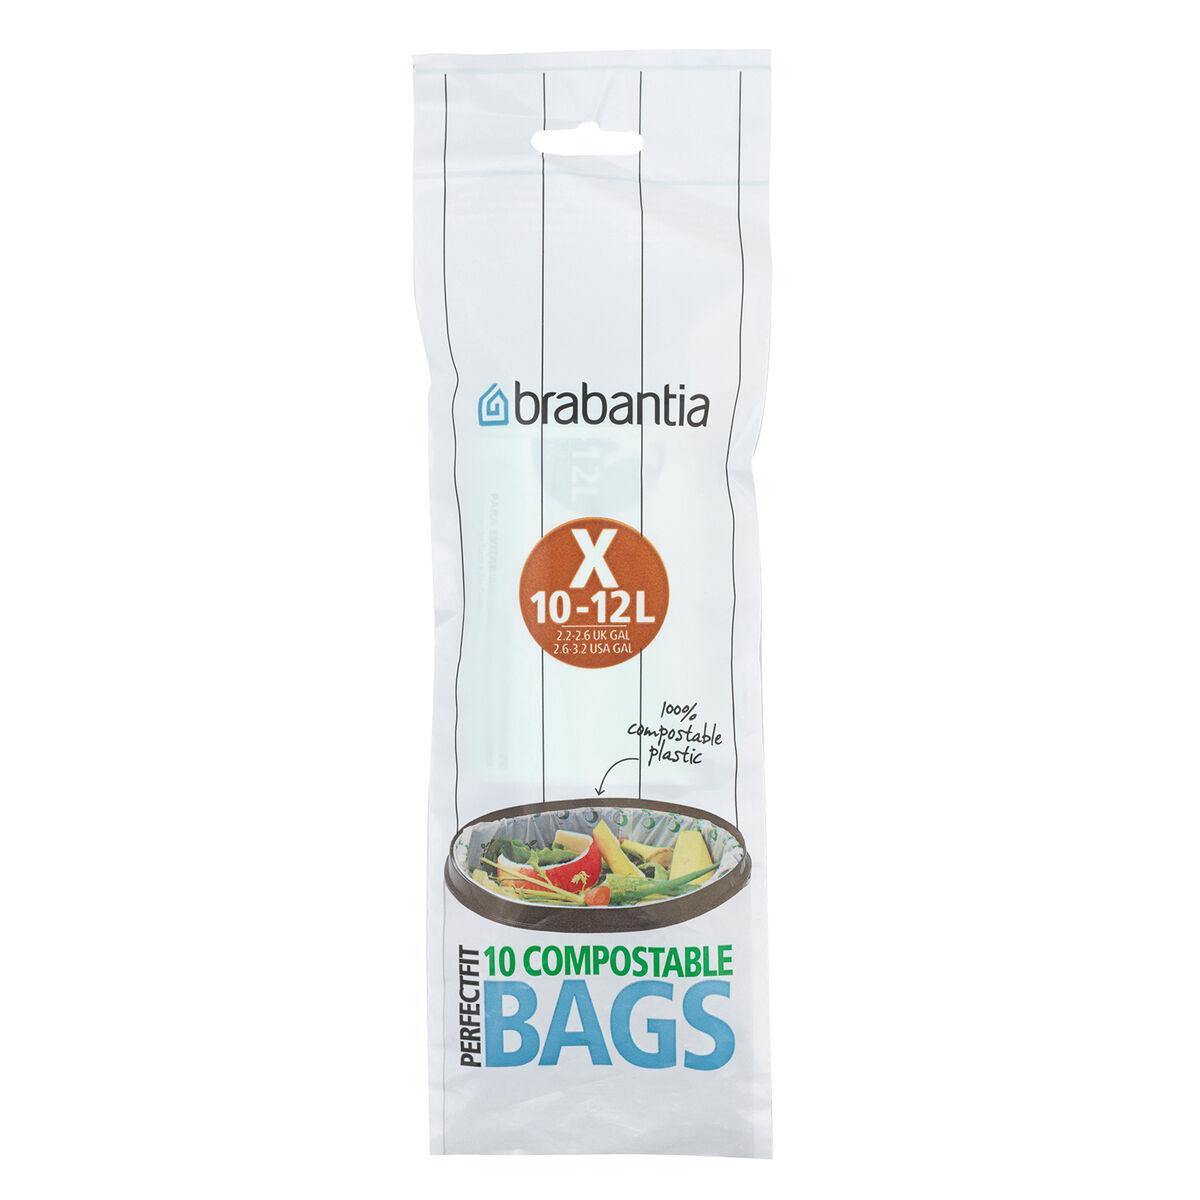 Brabantia PerfectFit biohajoavat roskapussit 10-12 L, 10 kpl,  X, vihreä